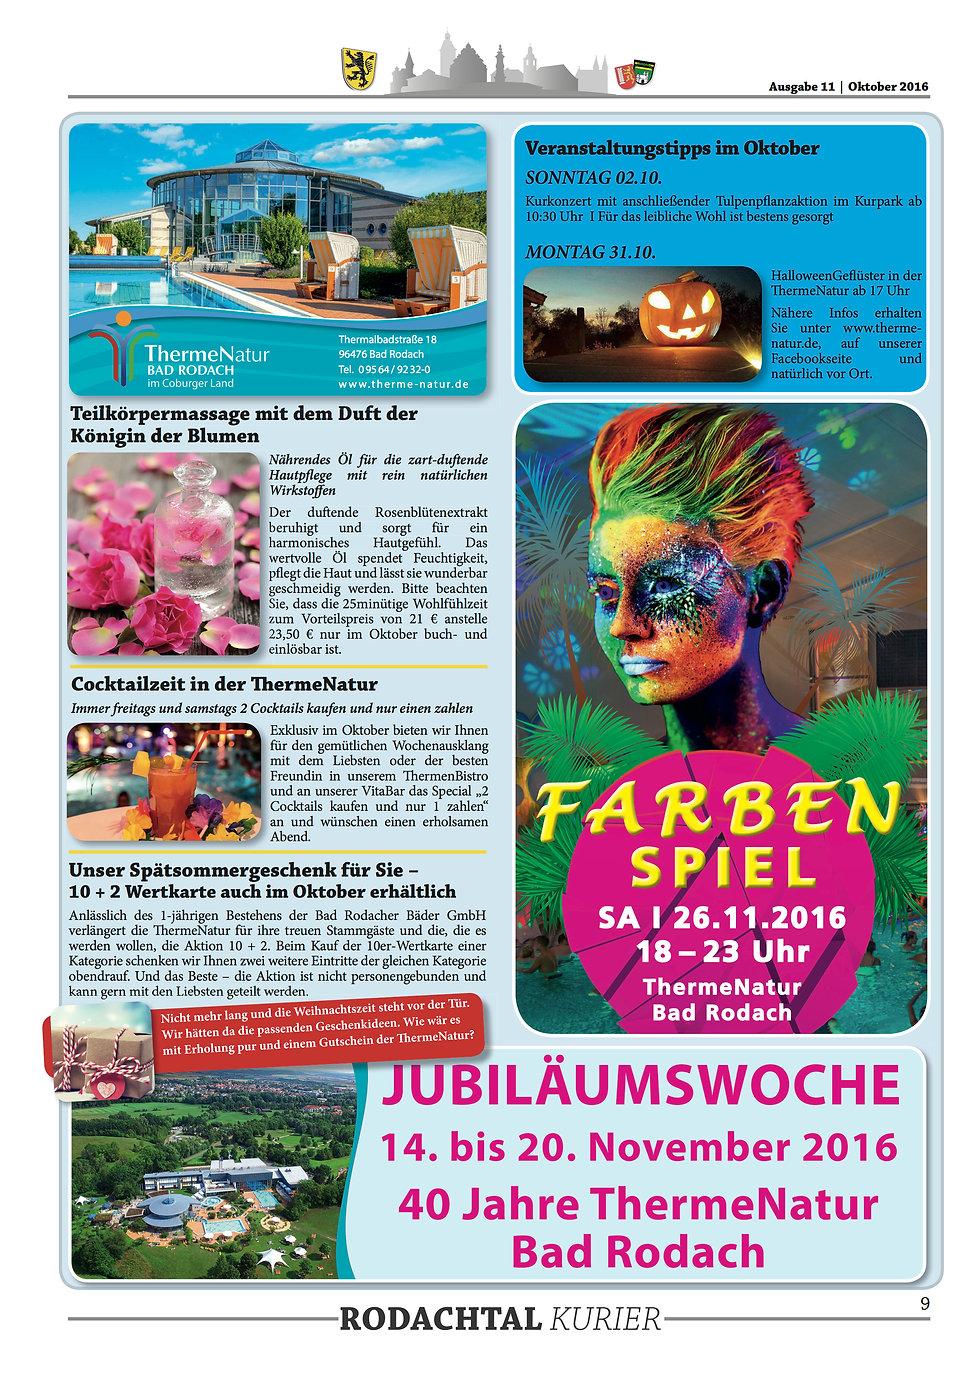 Therme Natur Bad Rodach Aktionen im Oktober